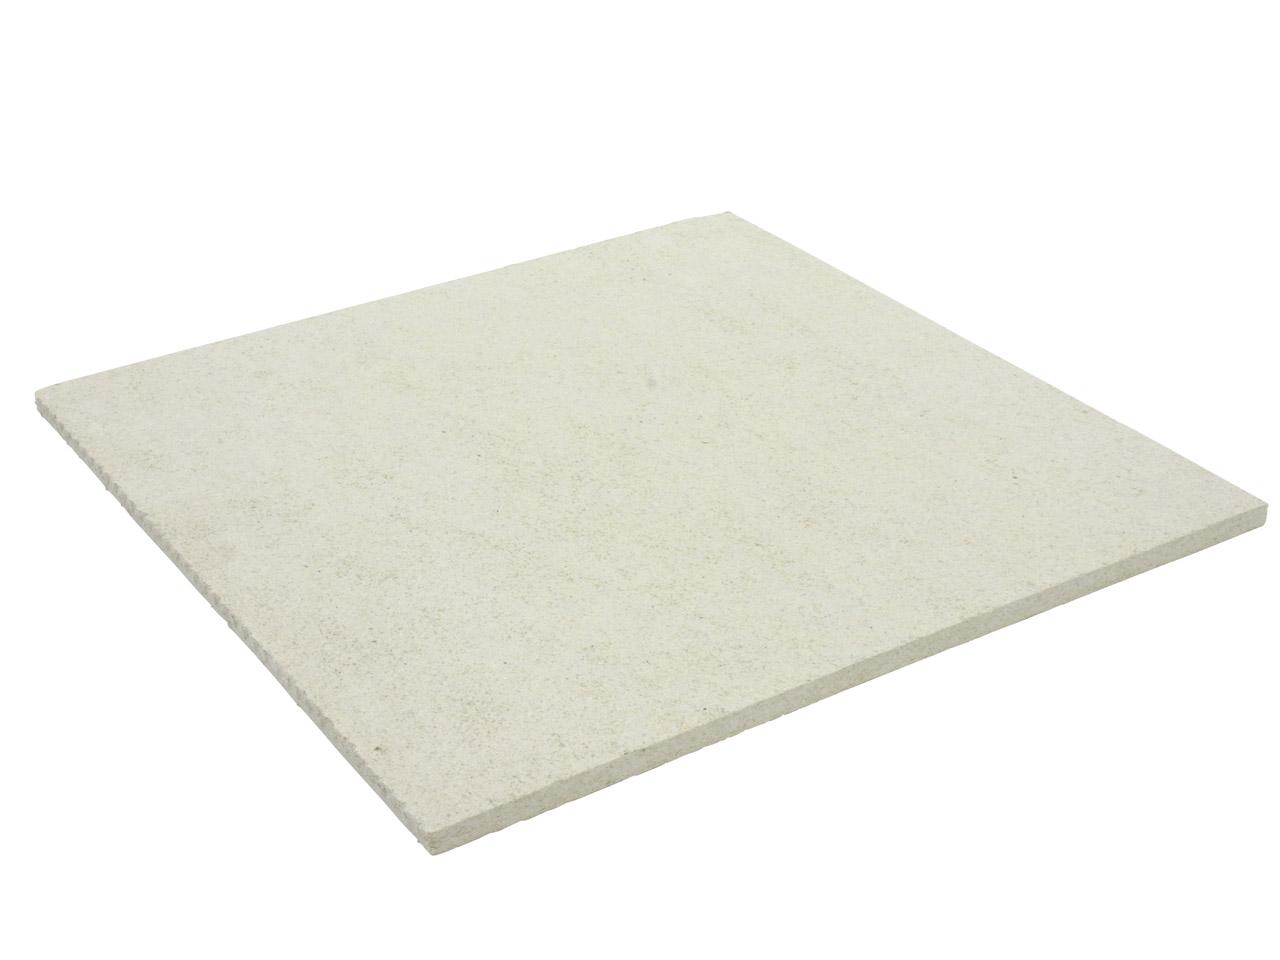 Soldering Sheet 300 X 300 X 9mm Asbestos Substitute